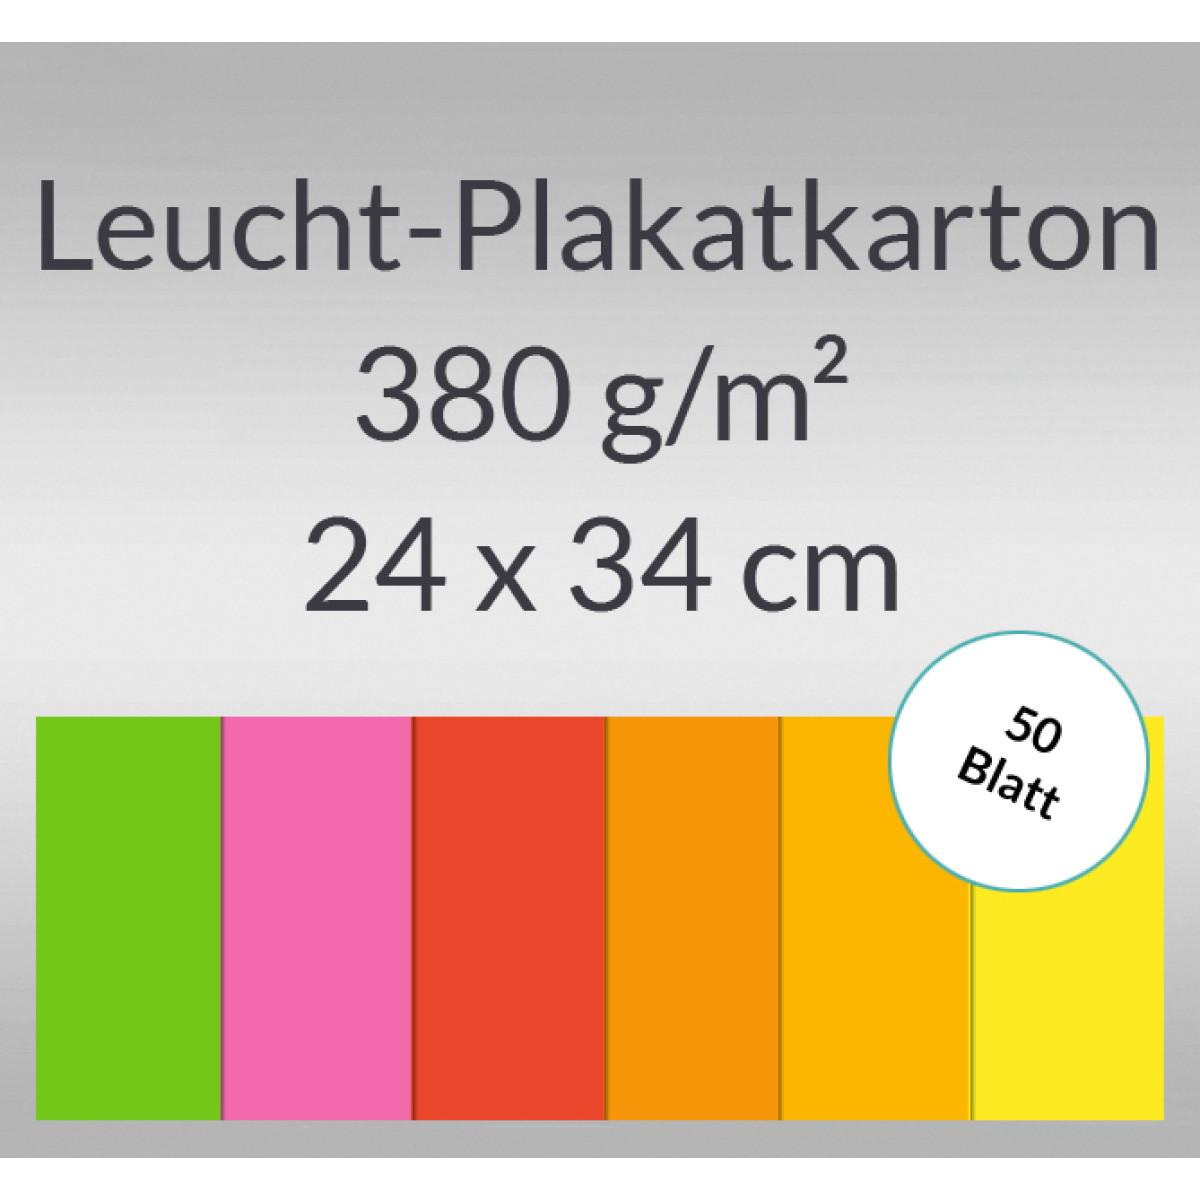 Leucht-Plakatkarton 380 g/qm 24 x 34 cm - 50 Blatt